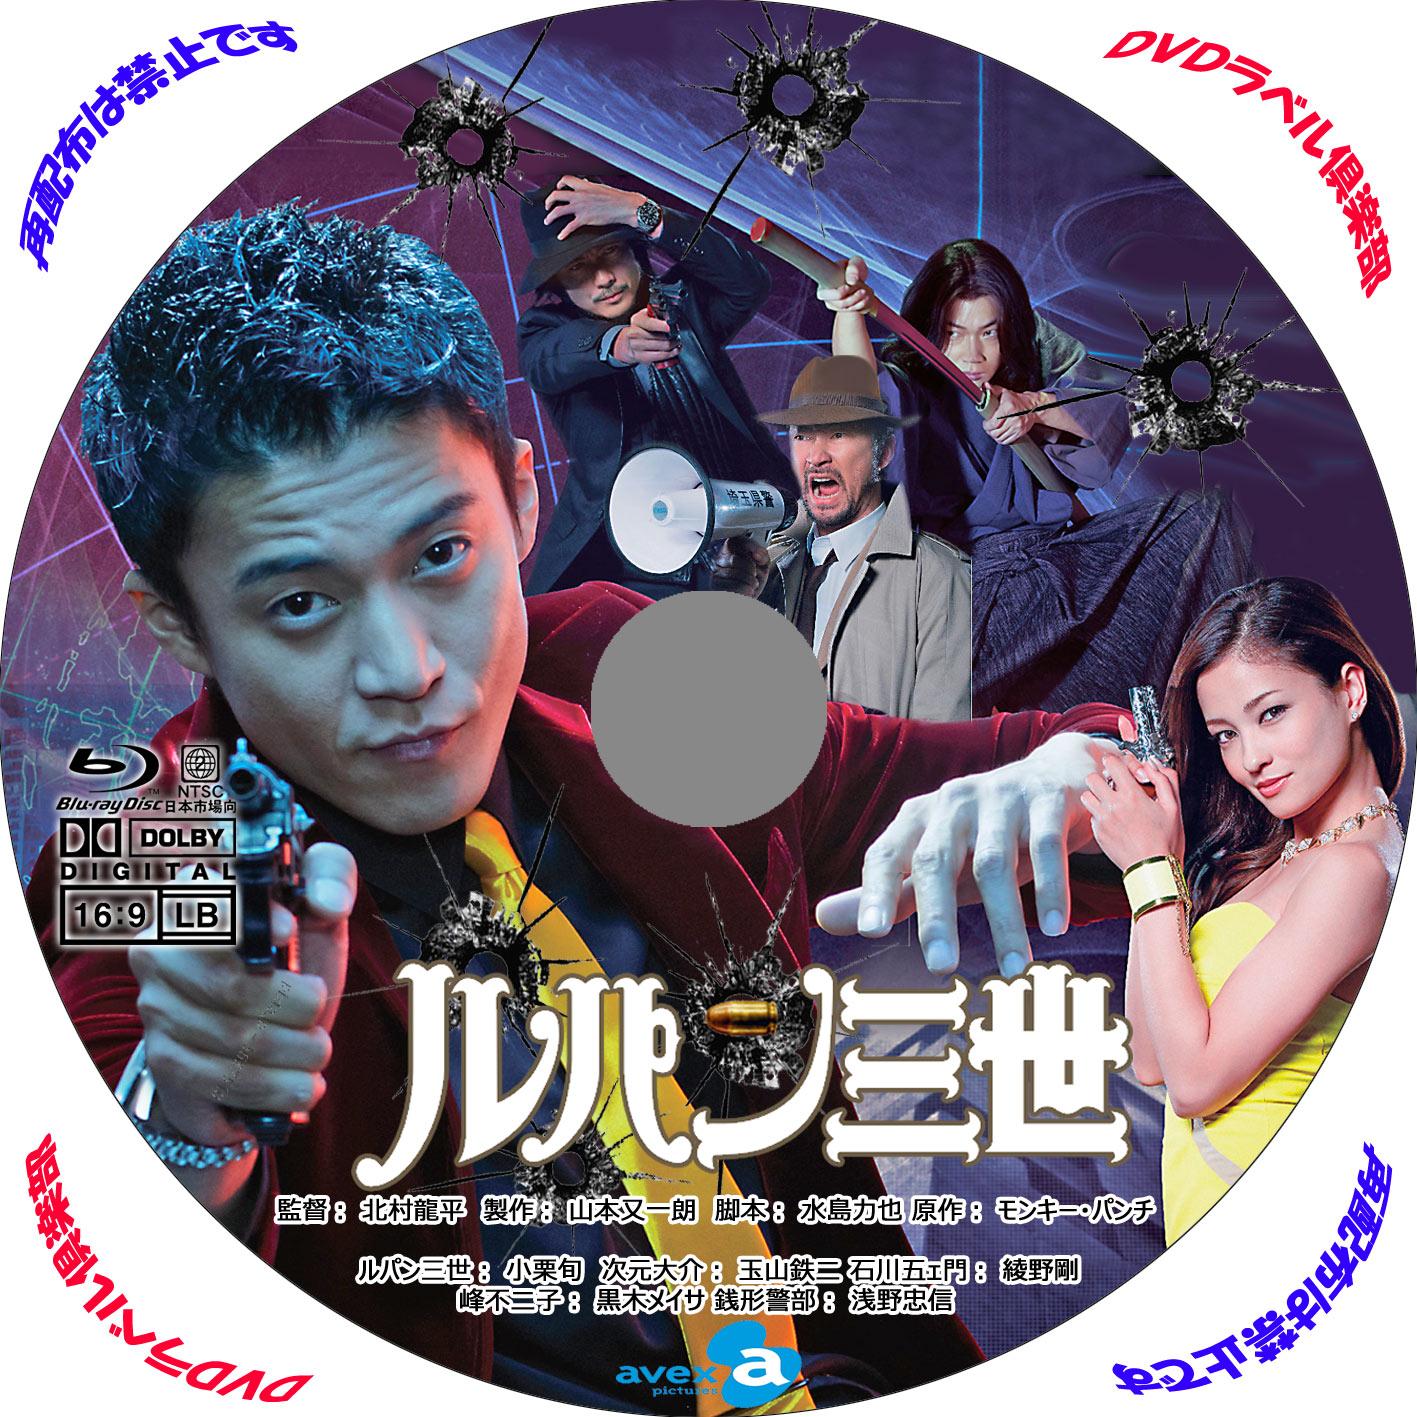 DVD BDラベル レンタル用 - DVDラベル倶楽部2号店